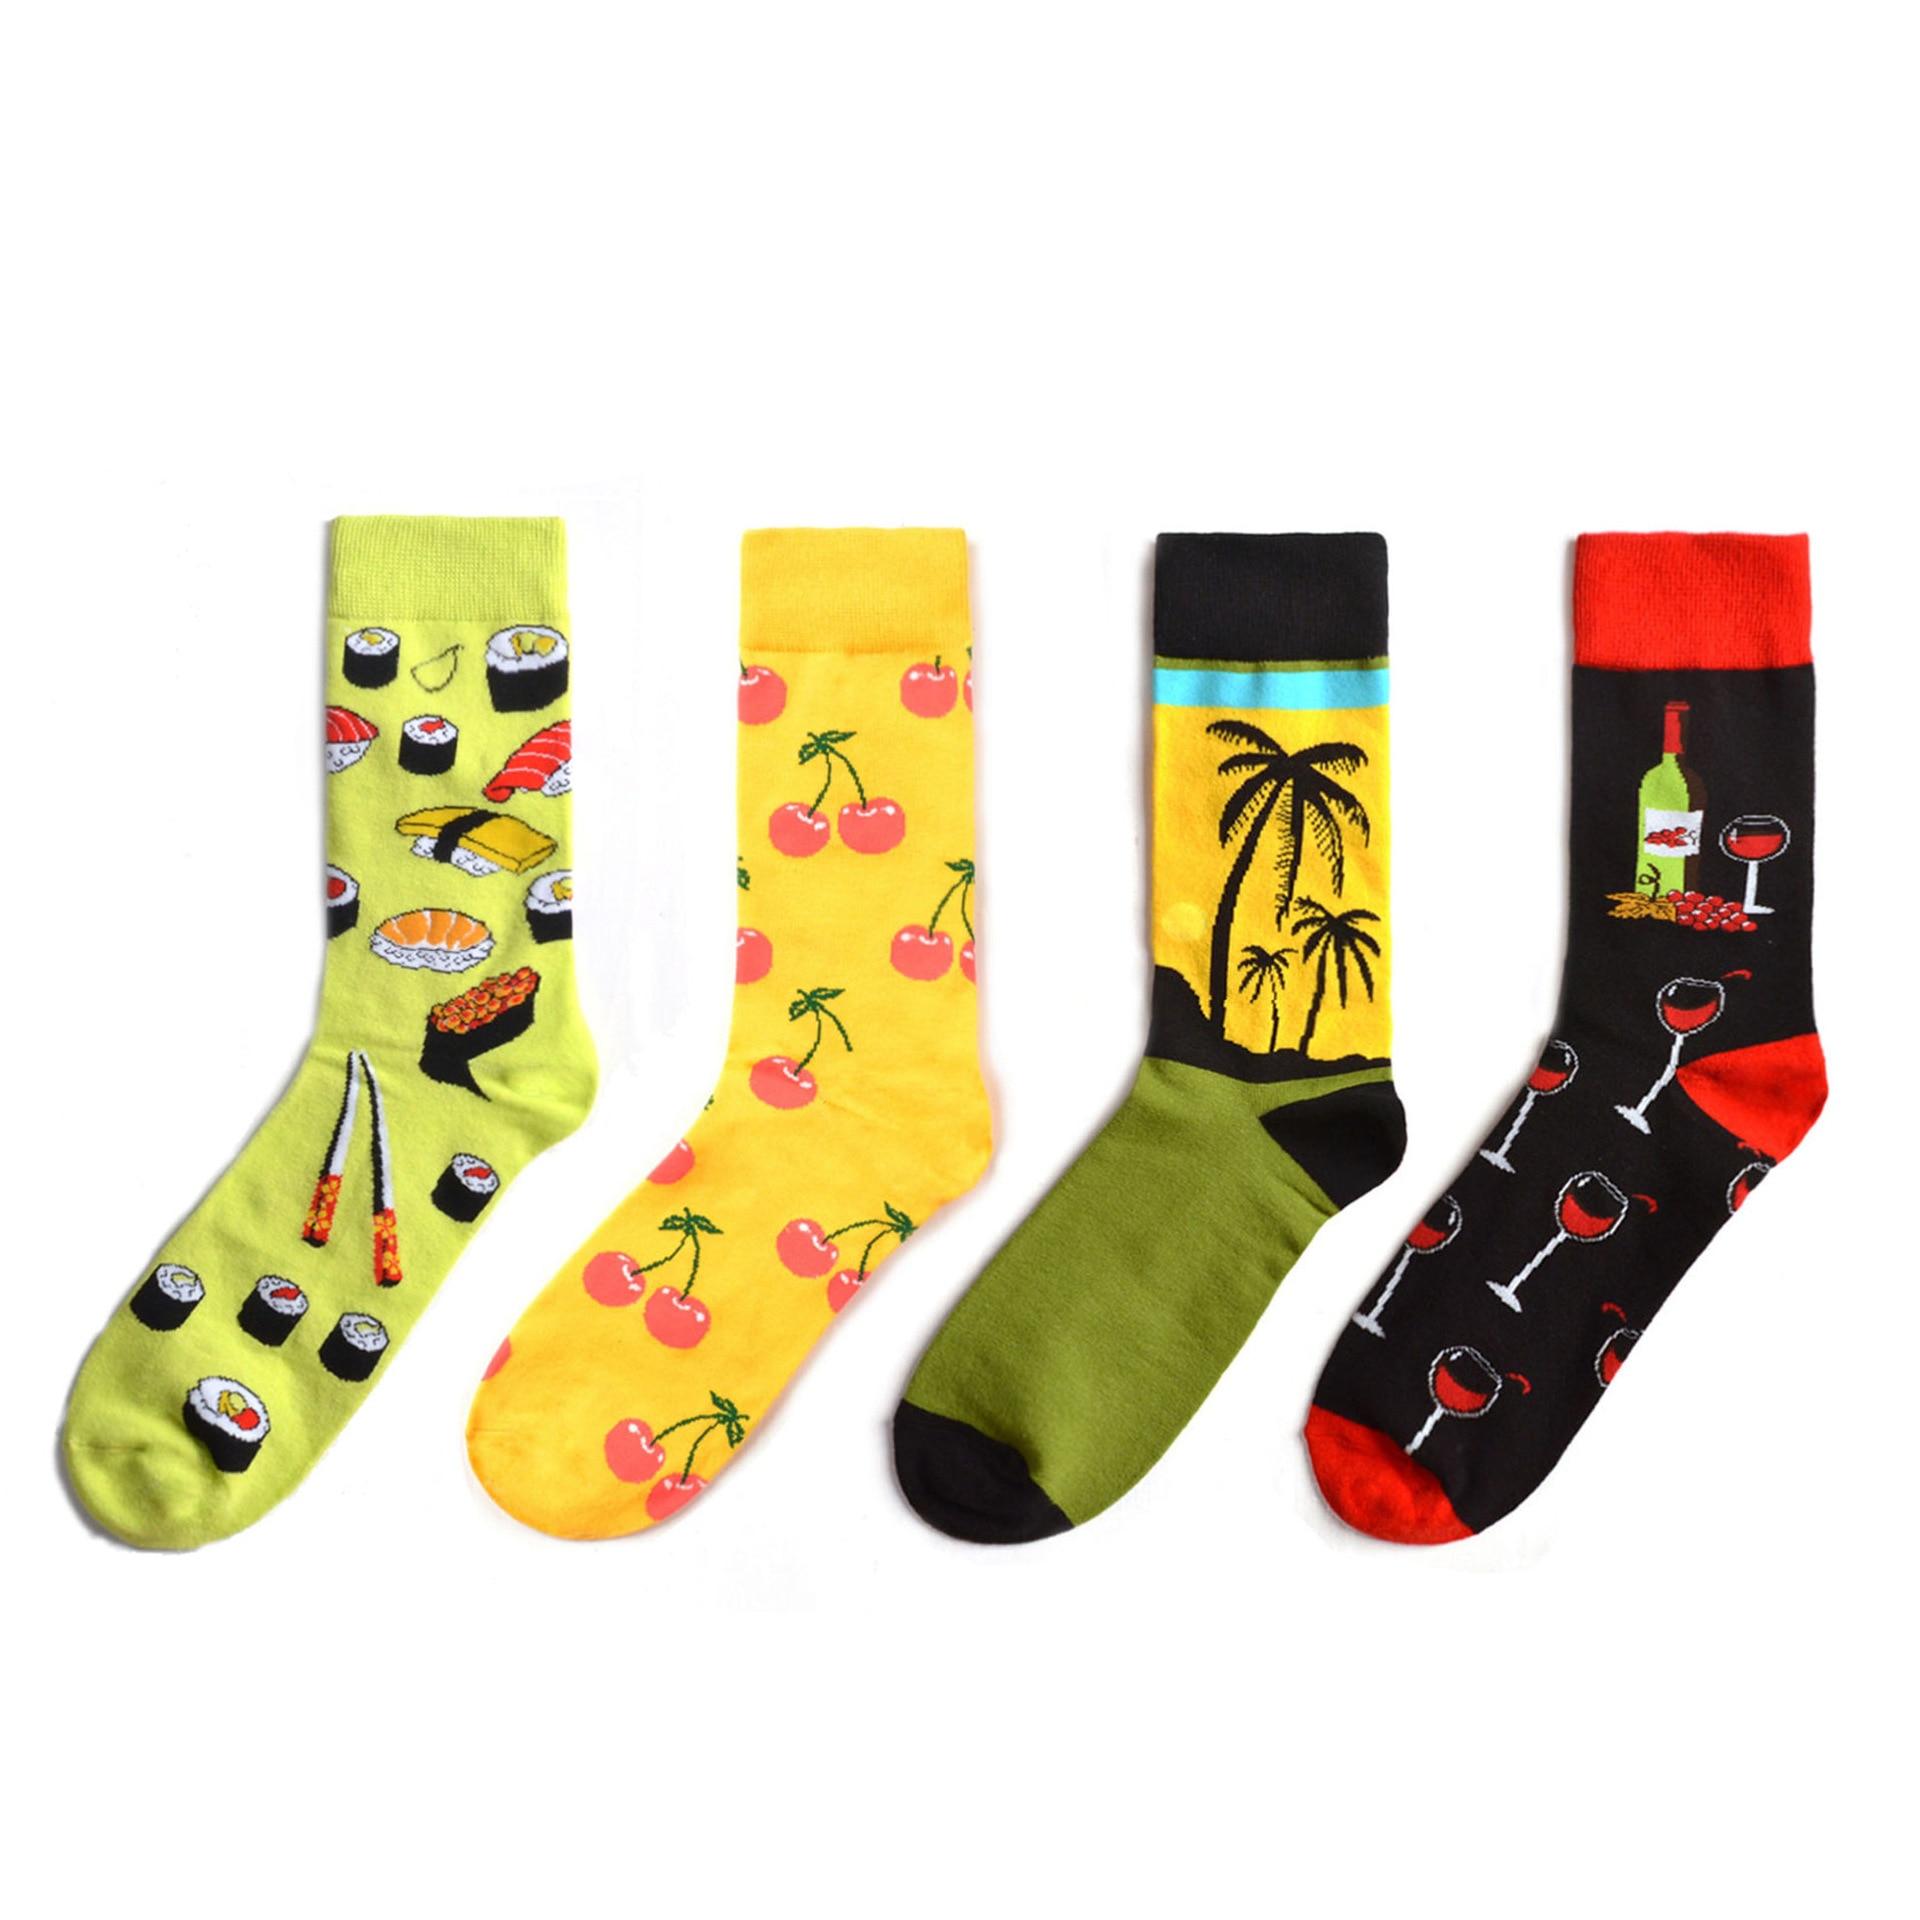 Hot Fashion Men's Long Socks Harajuku Hip Hop Funny Cherry Banana Sushi Pattern Cool Colorful Dress Socks For Male Wedding Gifts